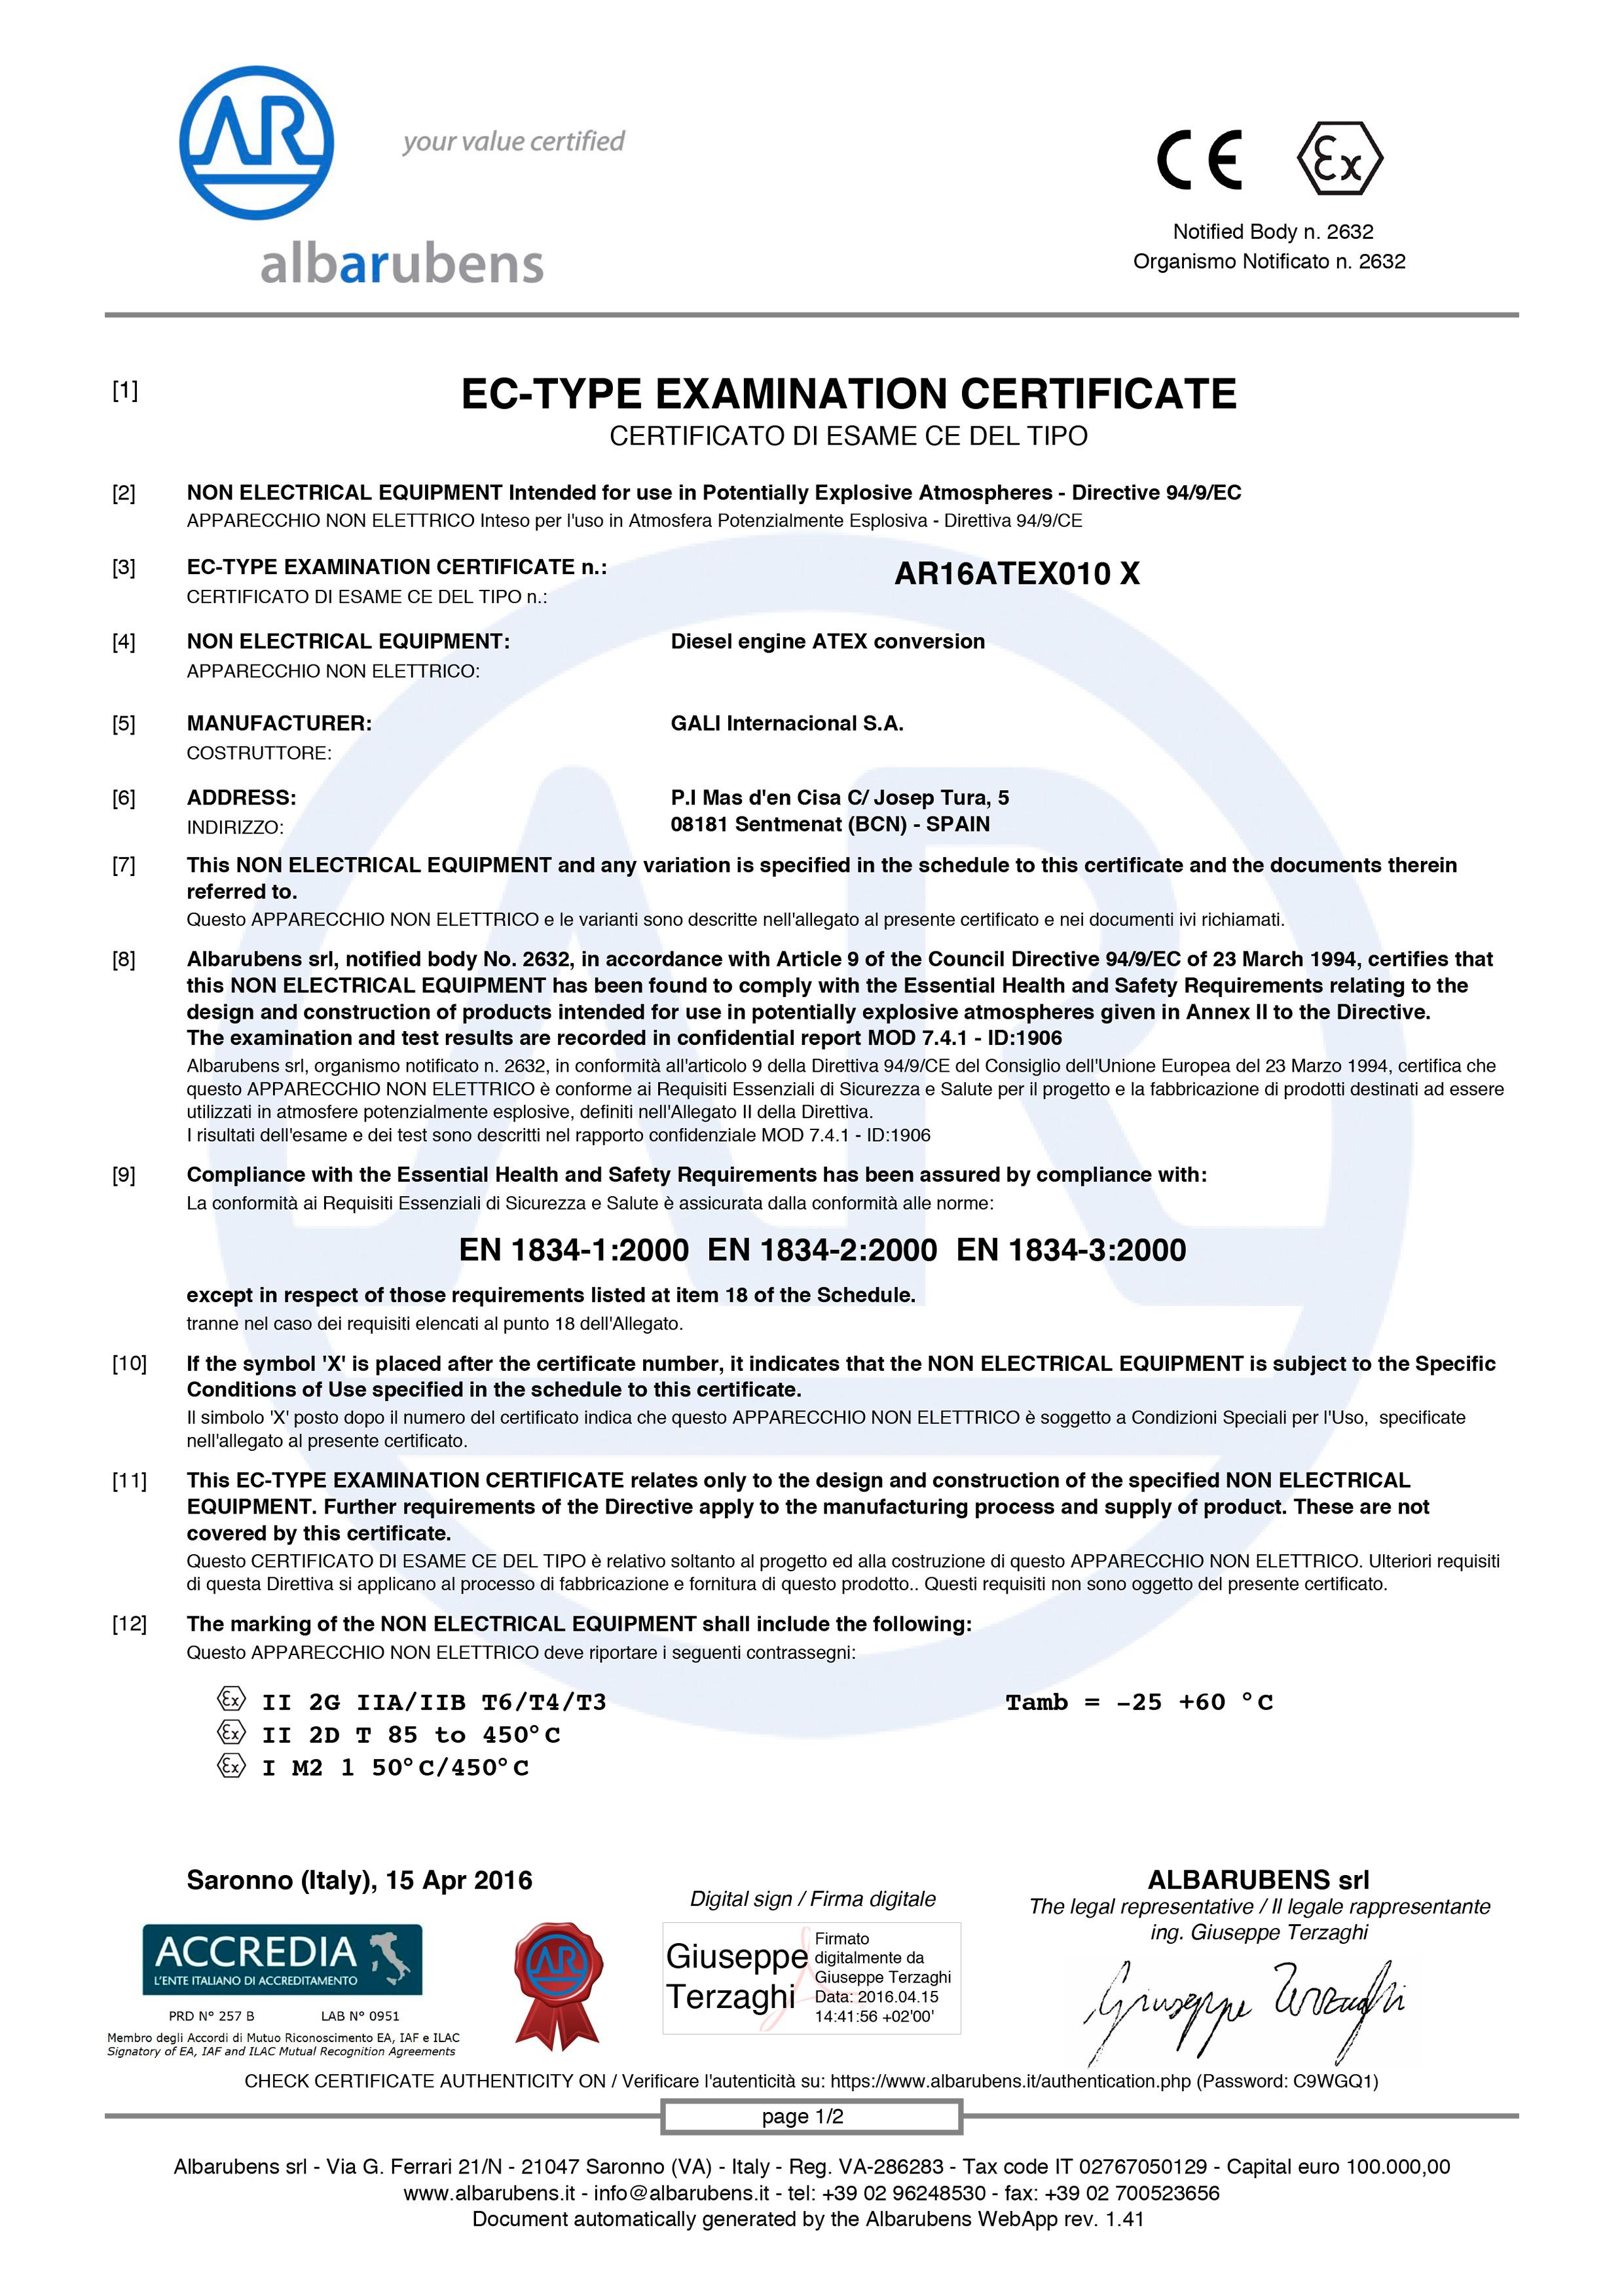 AR16ATEX010-X certificate